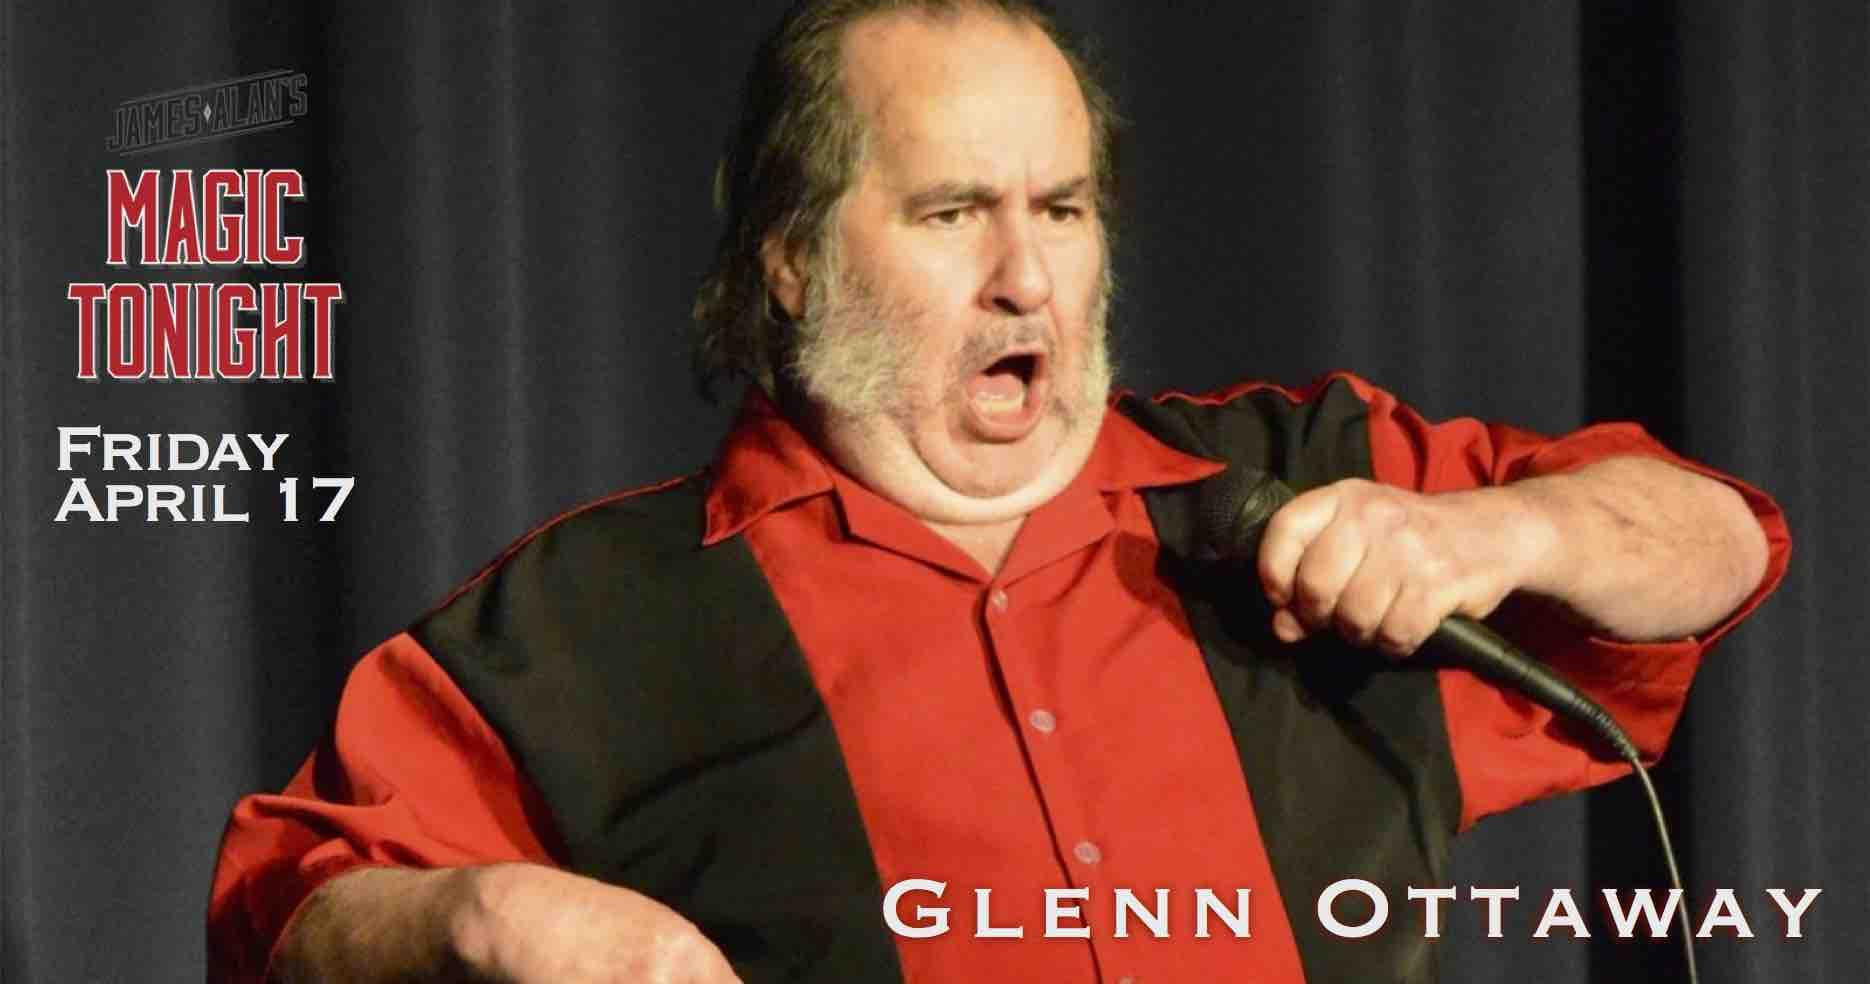 Apr 17 Glenn Ottaway